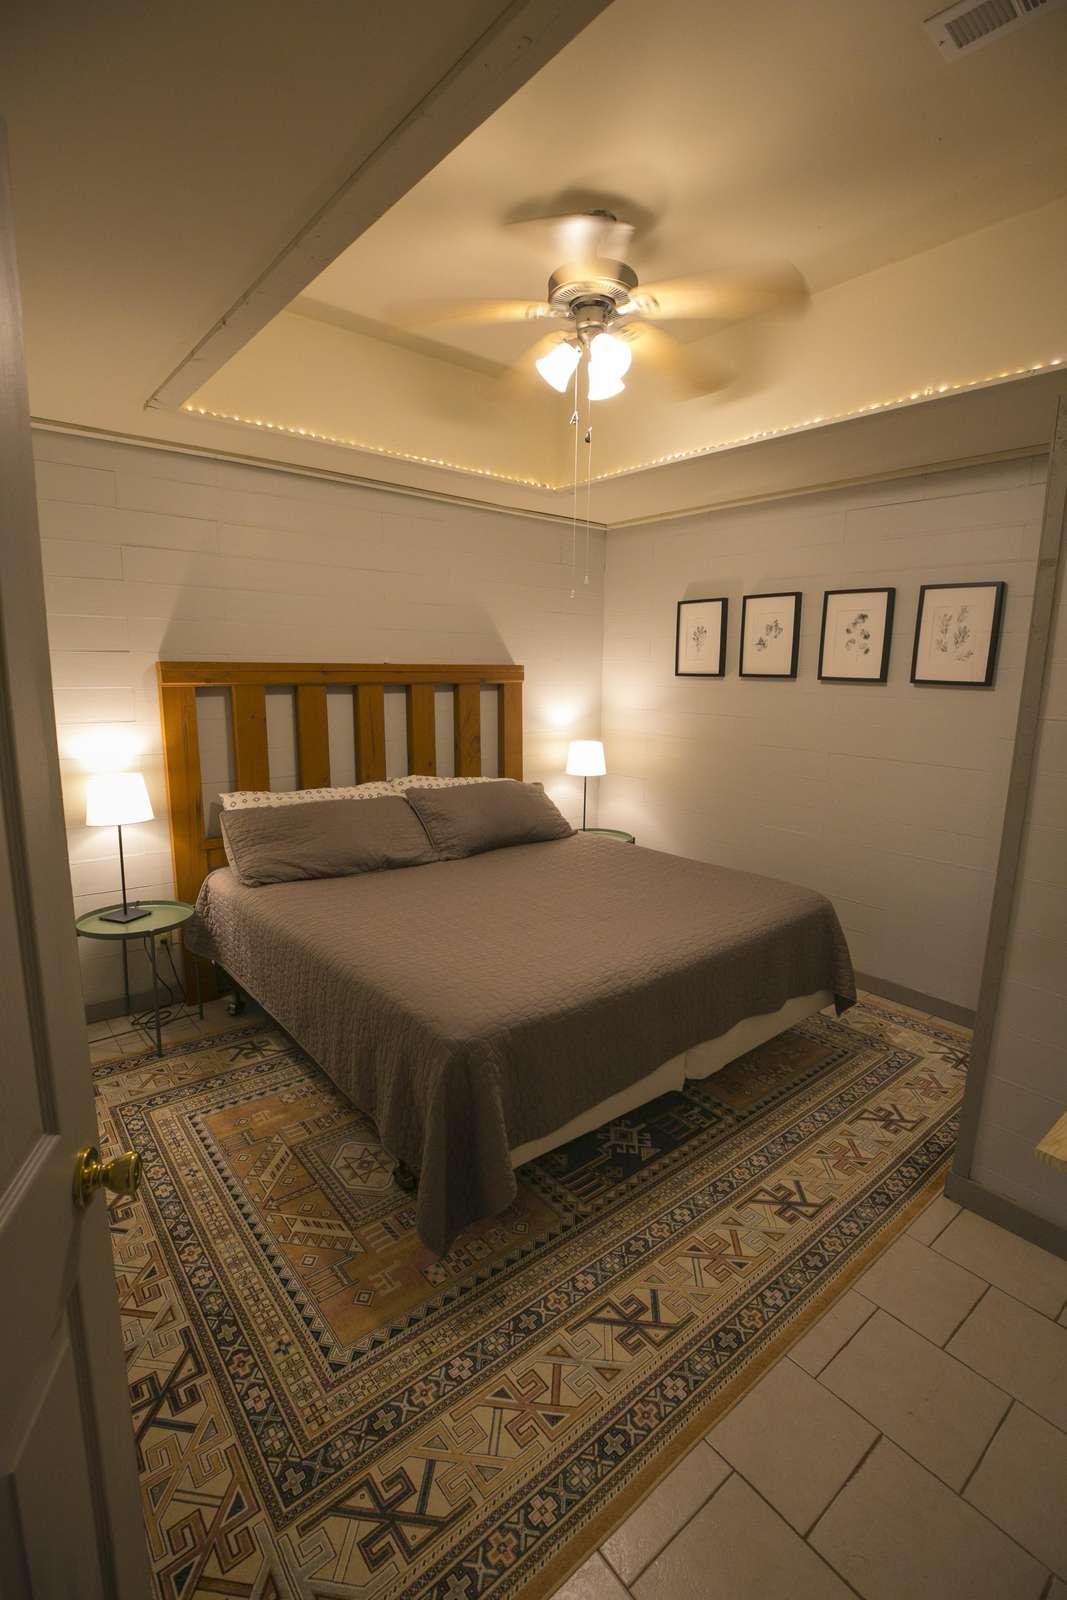 basement bedroom #2 (King bed)